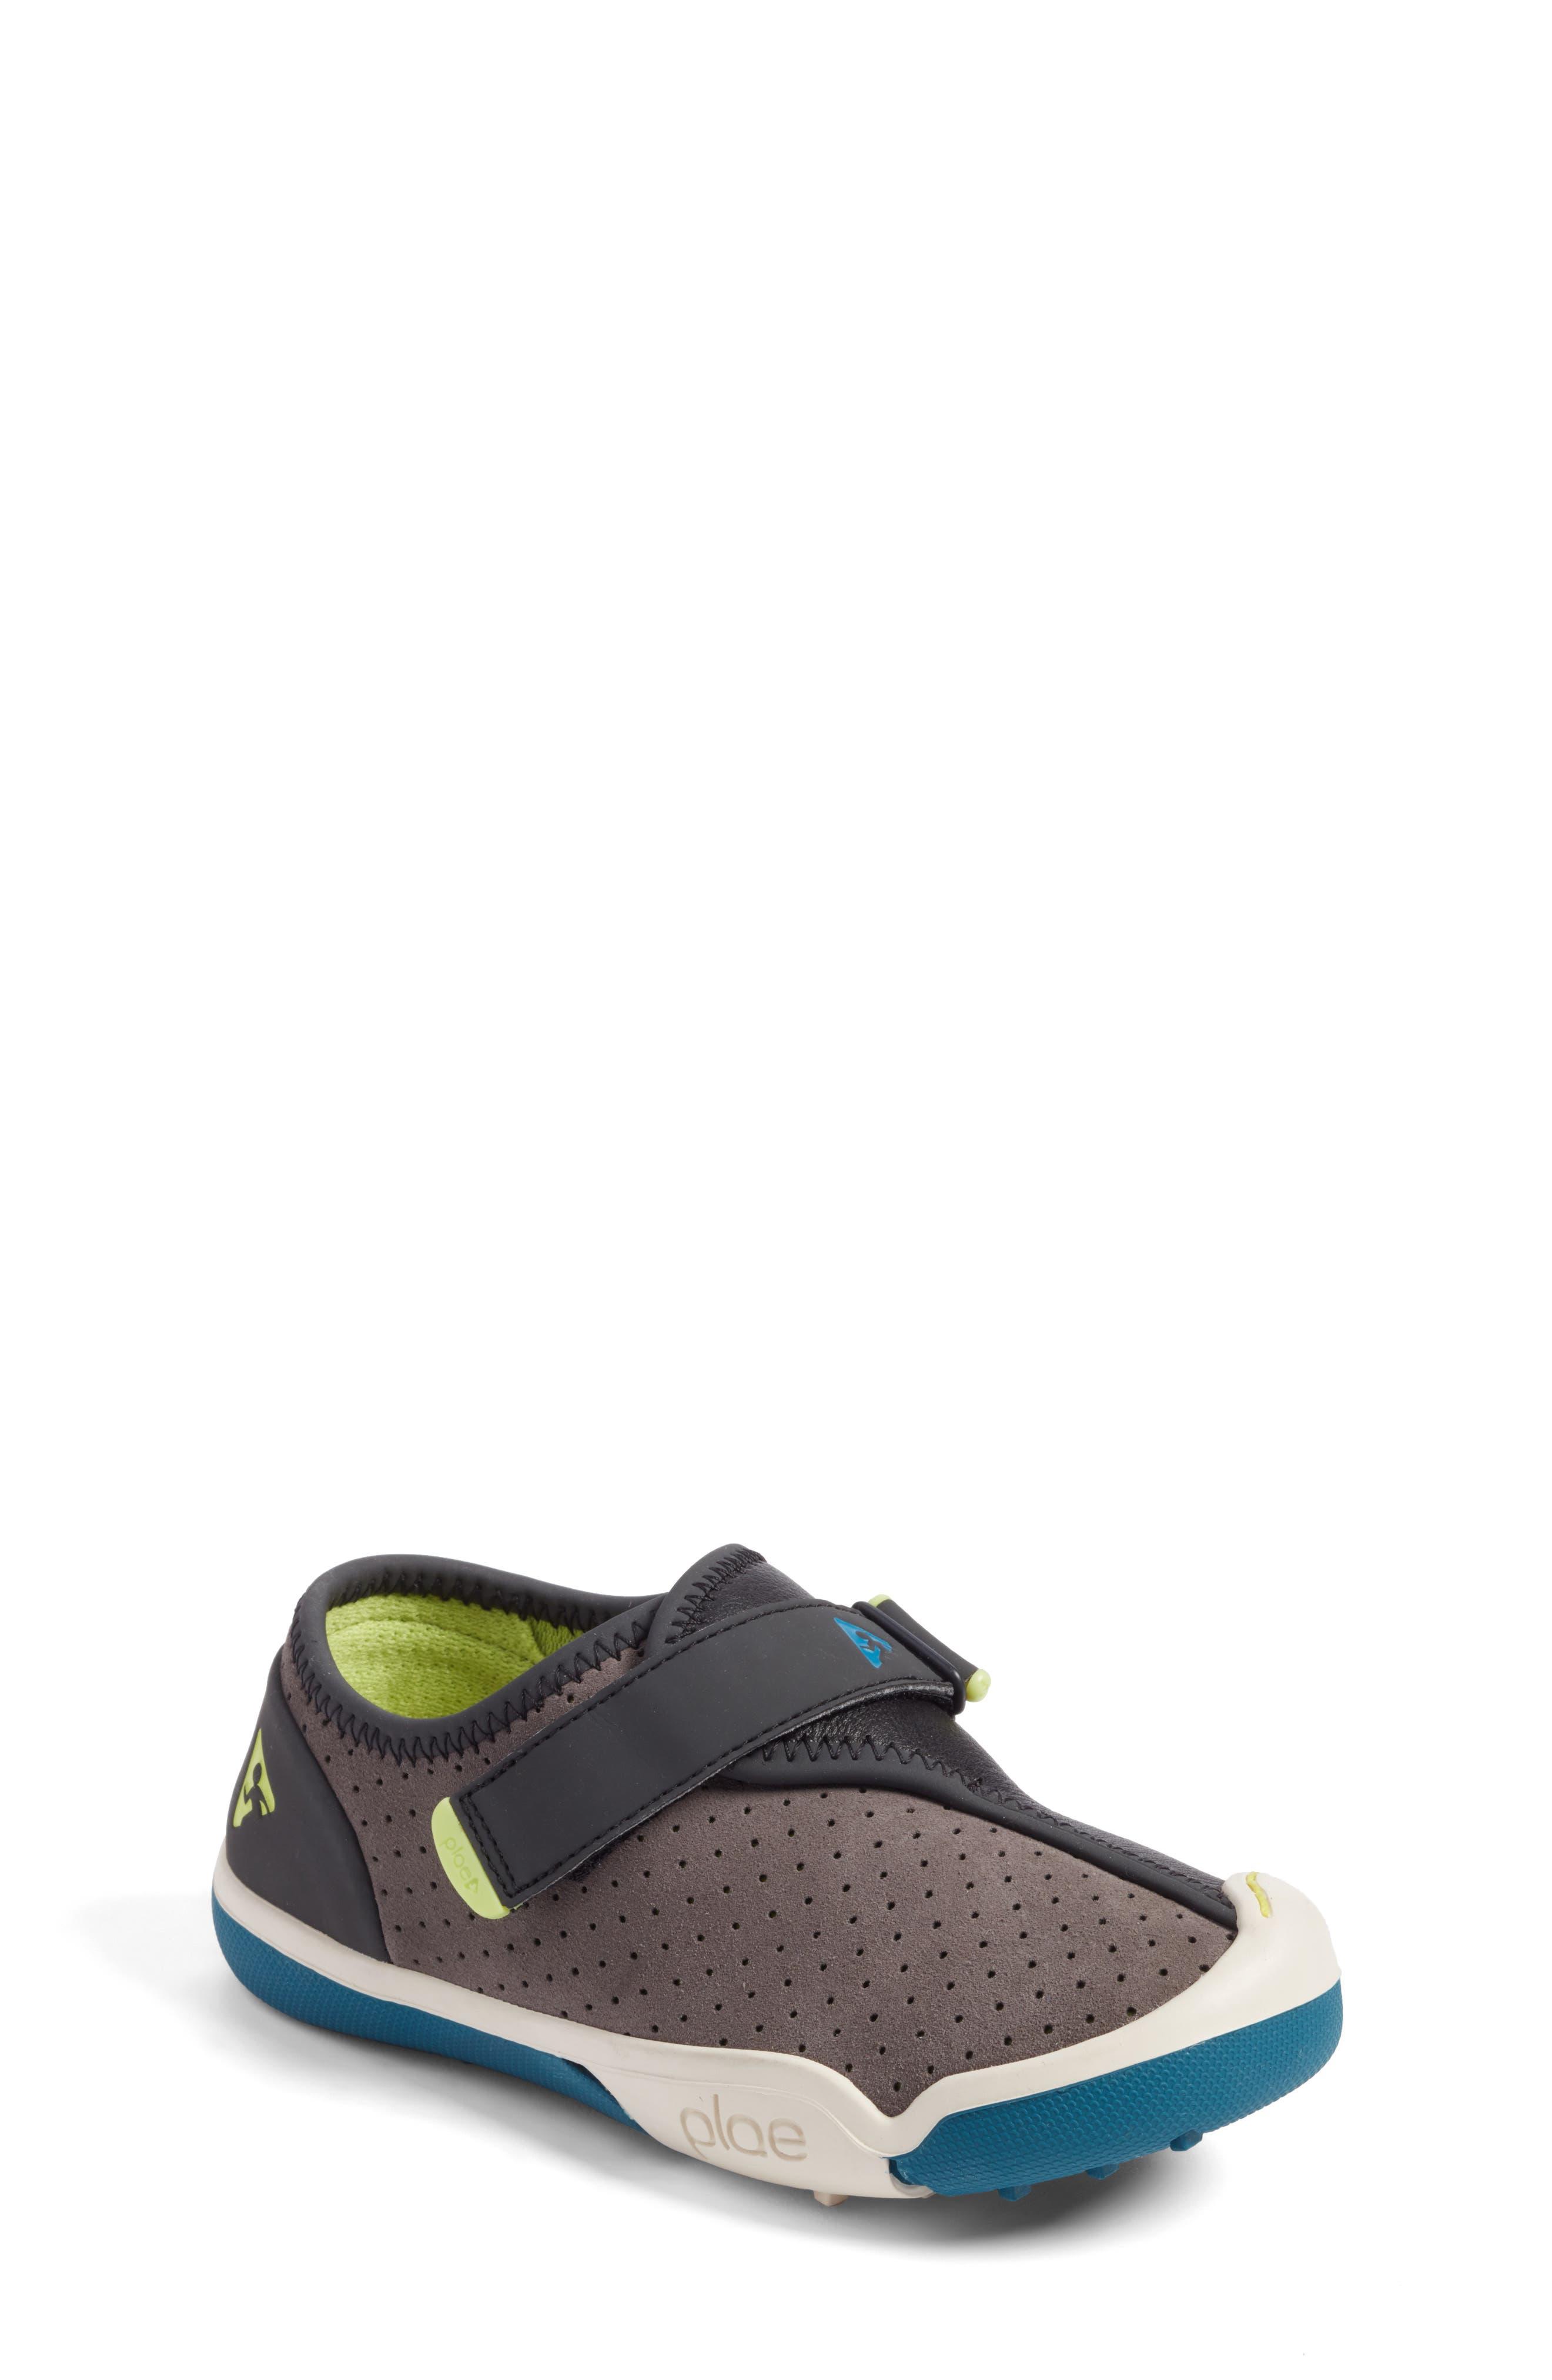 Cam Perforated Sneaker,                             Main thumbnail 1, color,                             025